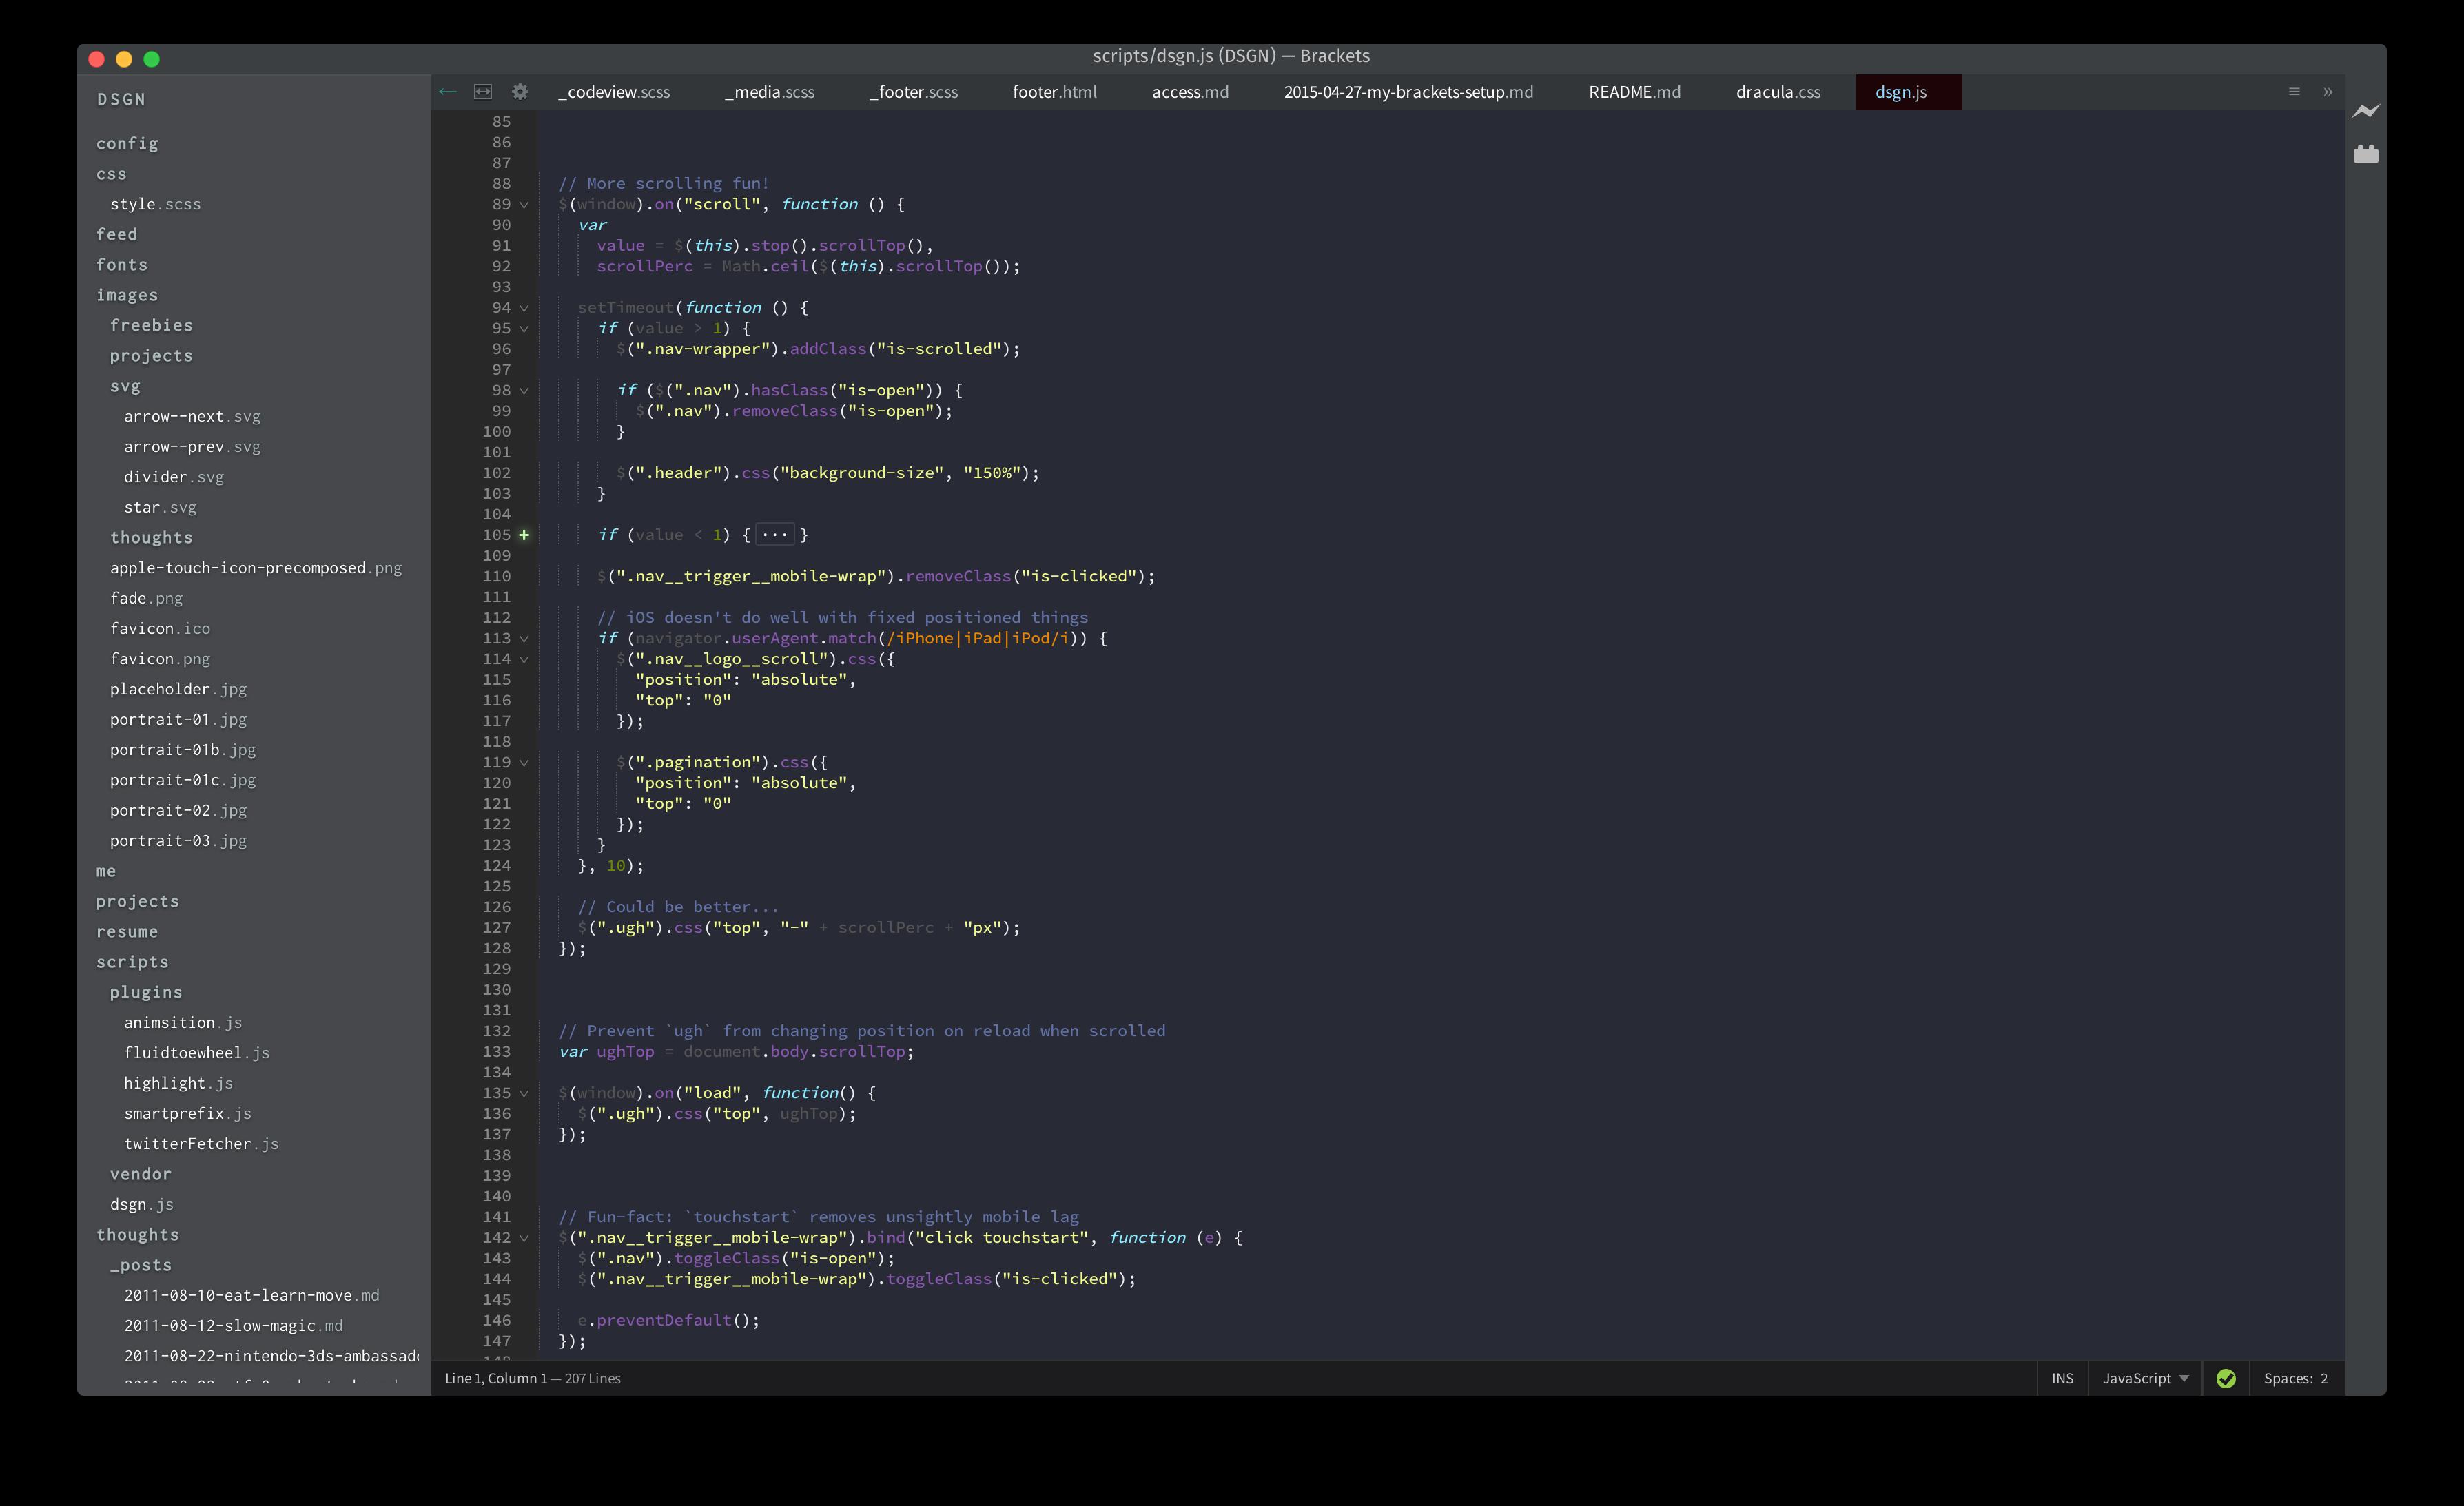 js_screenshot